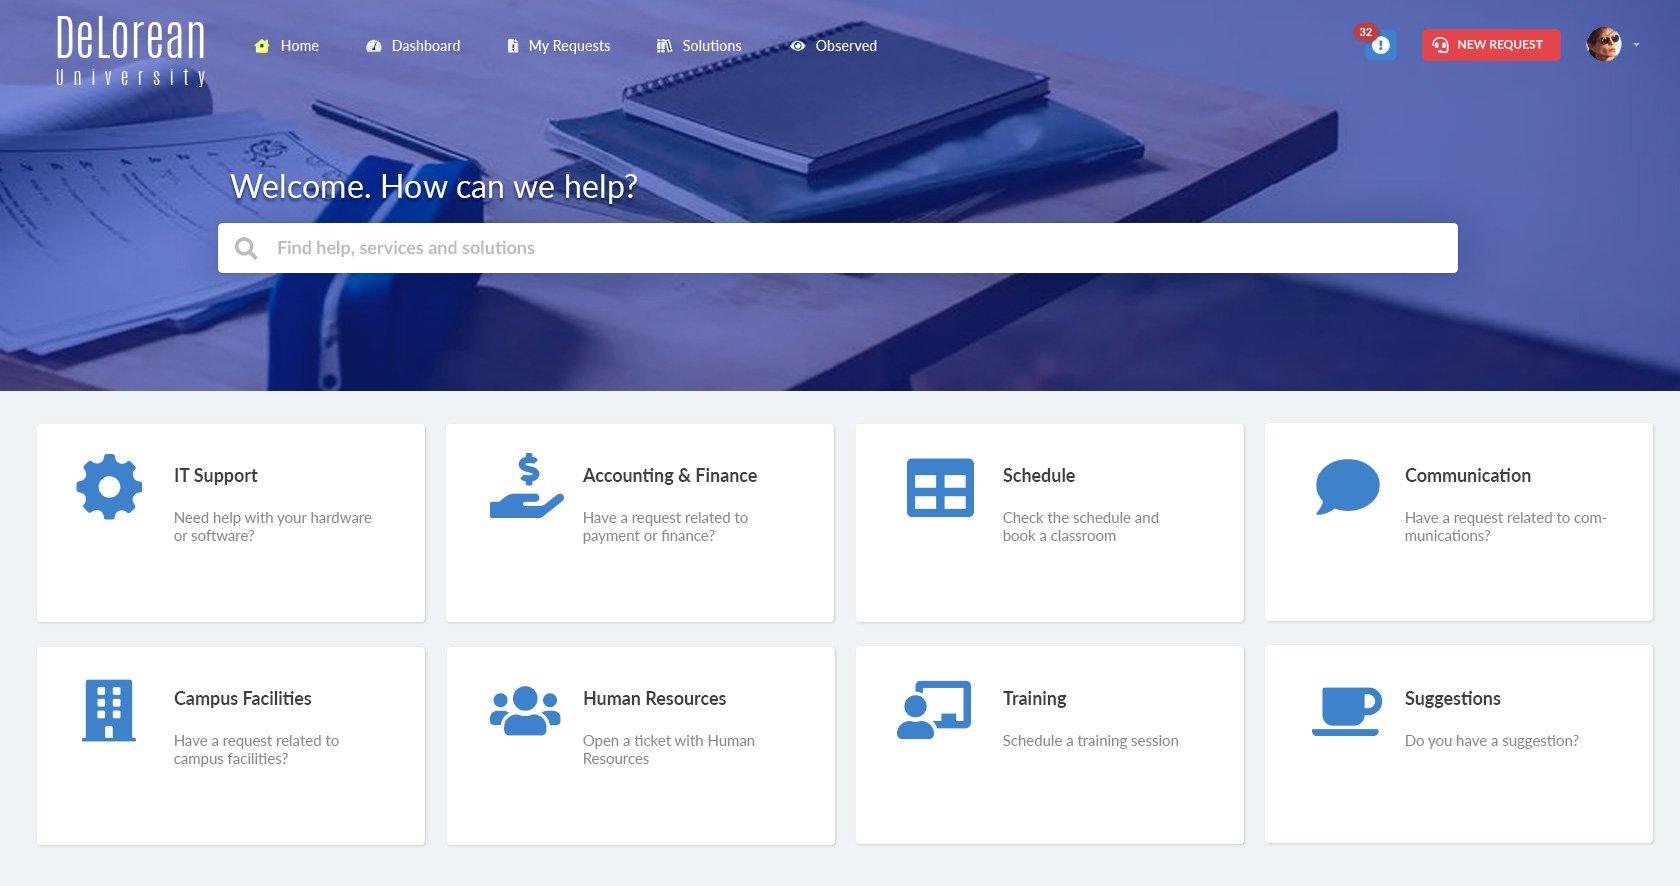 Self-service portal for a university